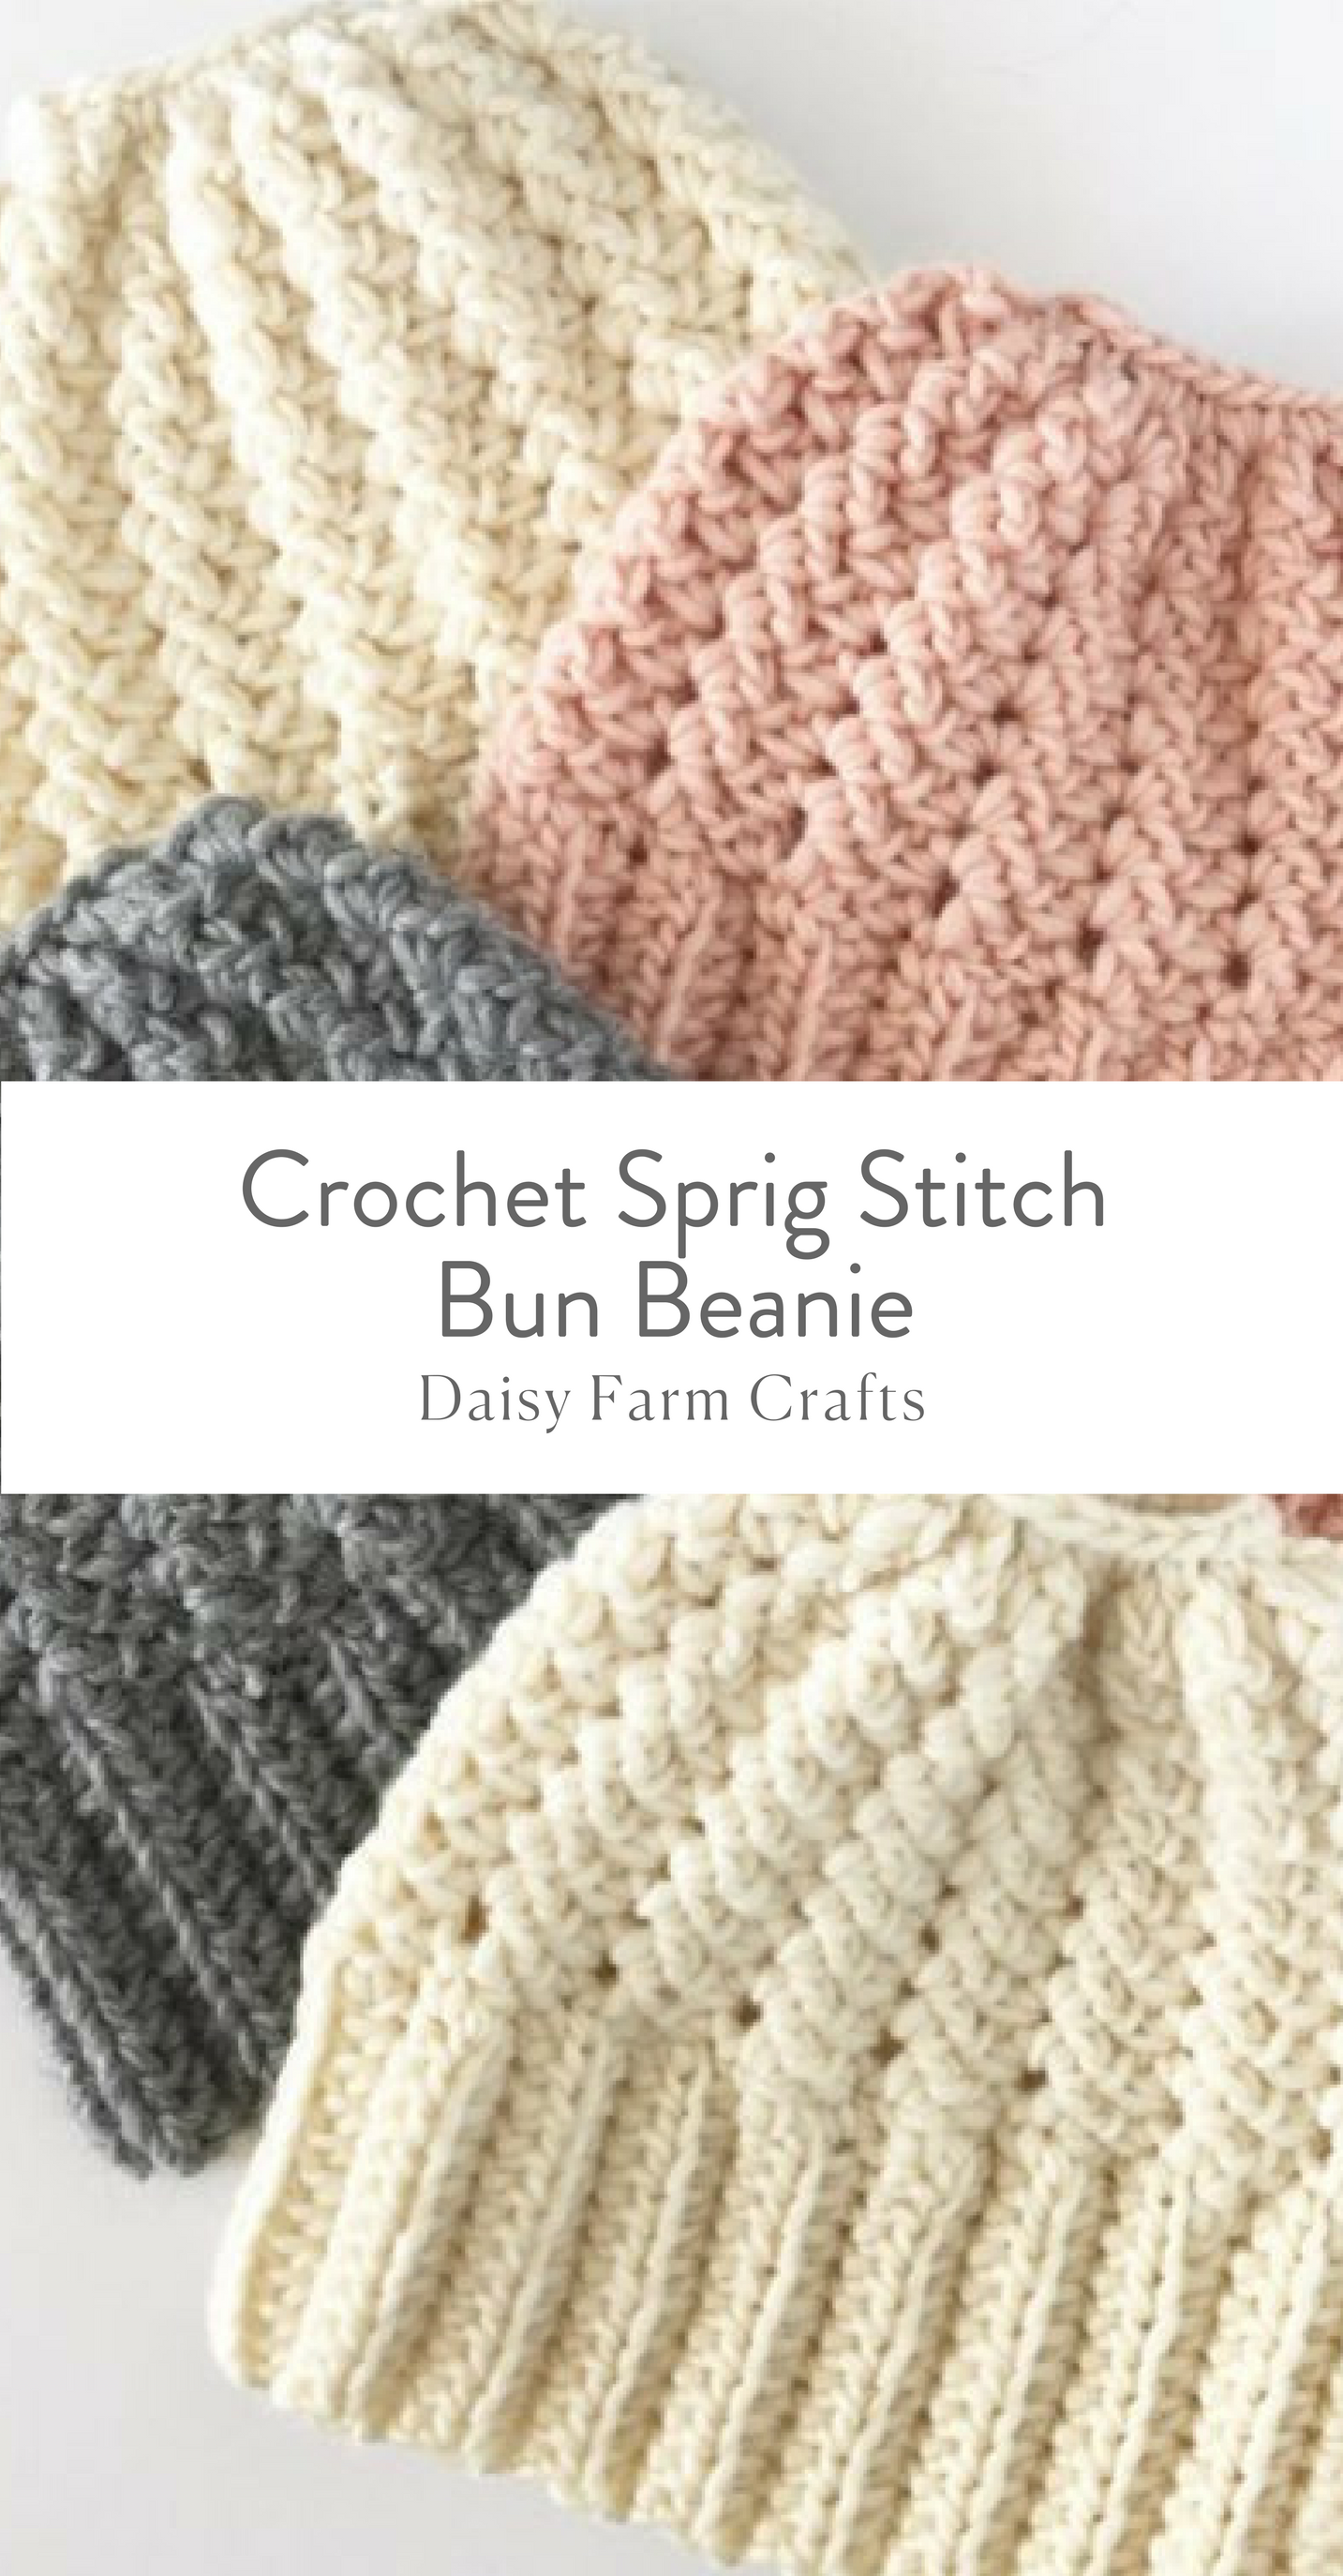 Free Pattern - Crochet Sprig Stitch Bun Beanie | Crochet Ideas ...